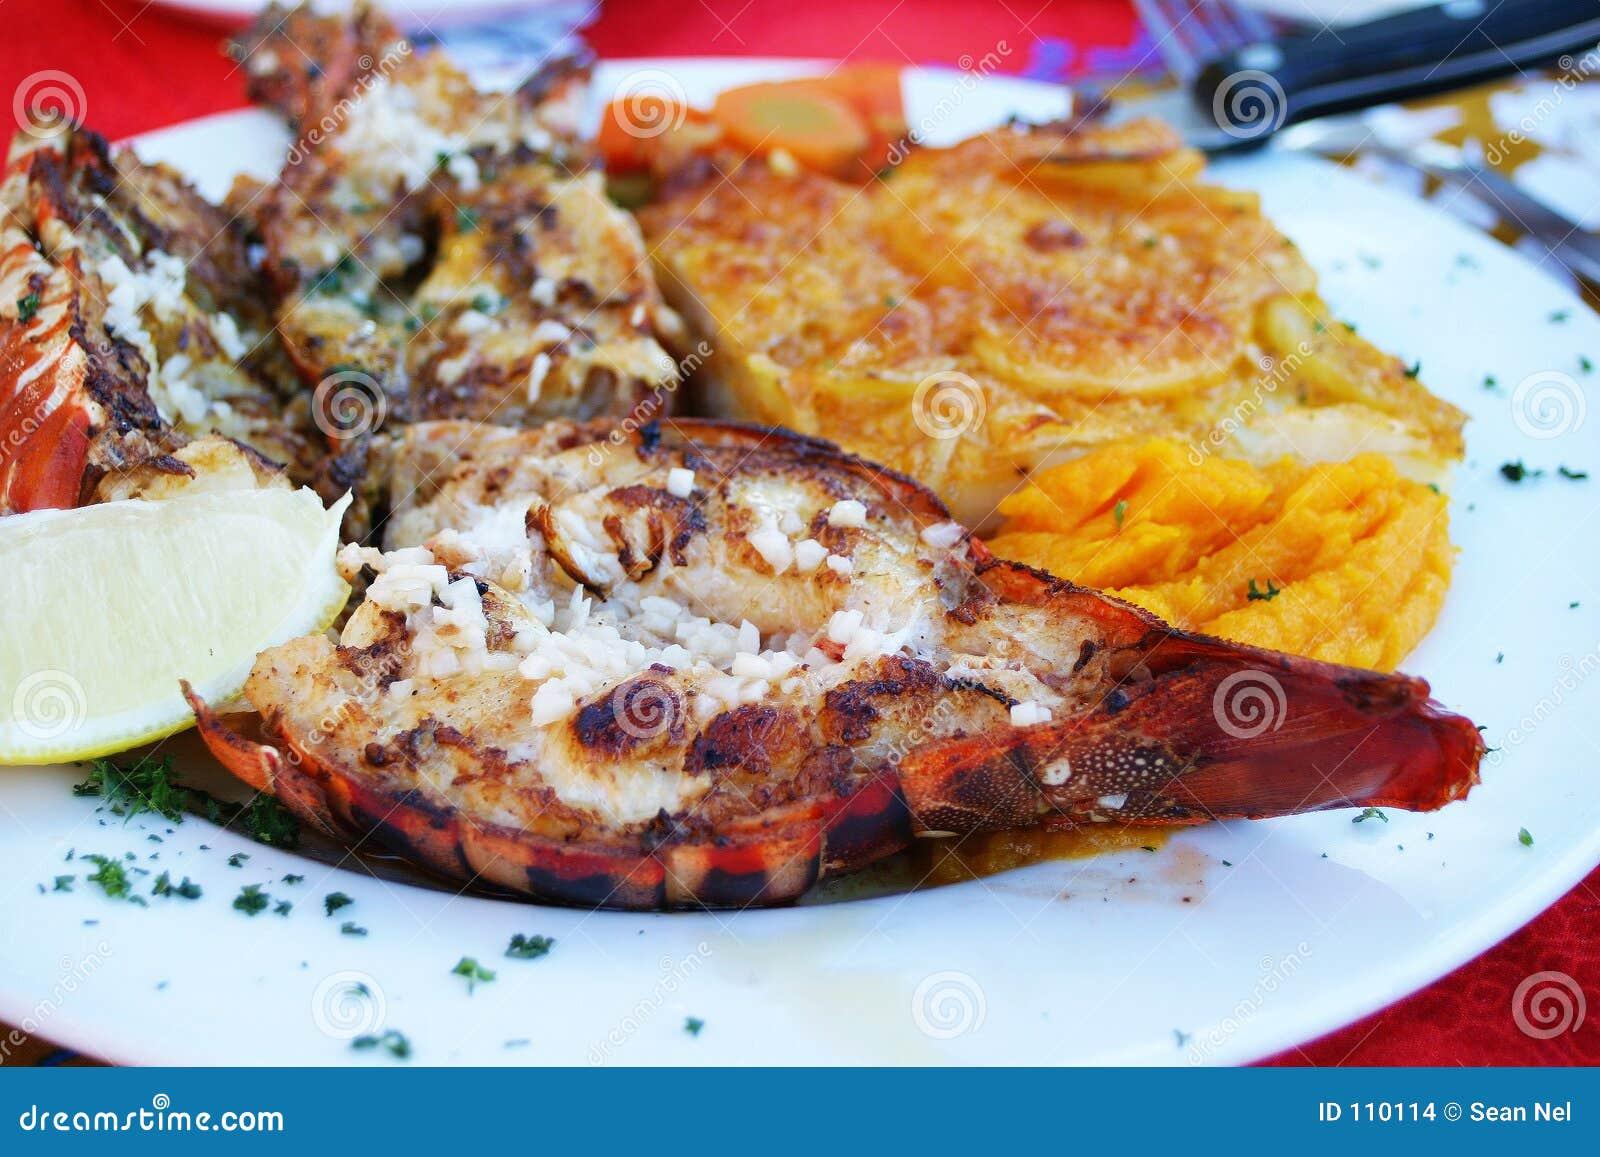 Mozambican Crayfish